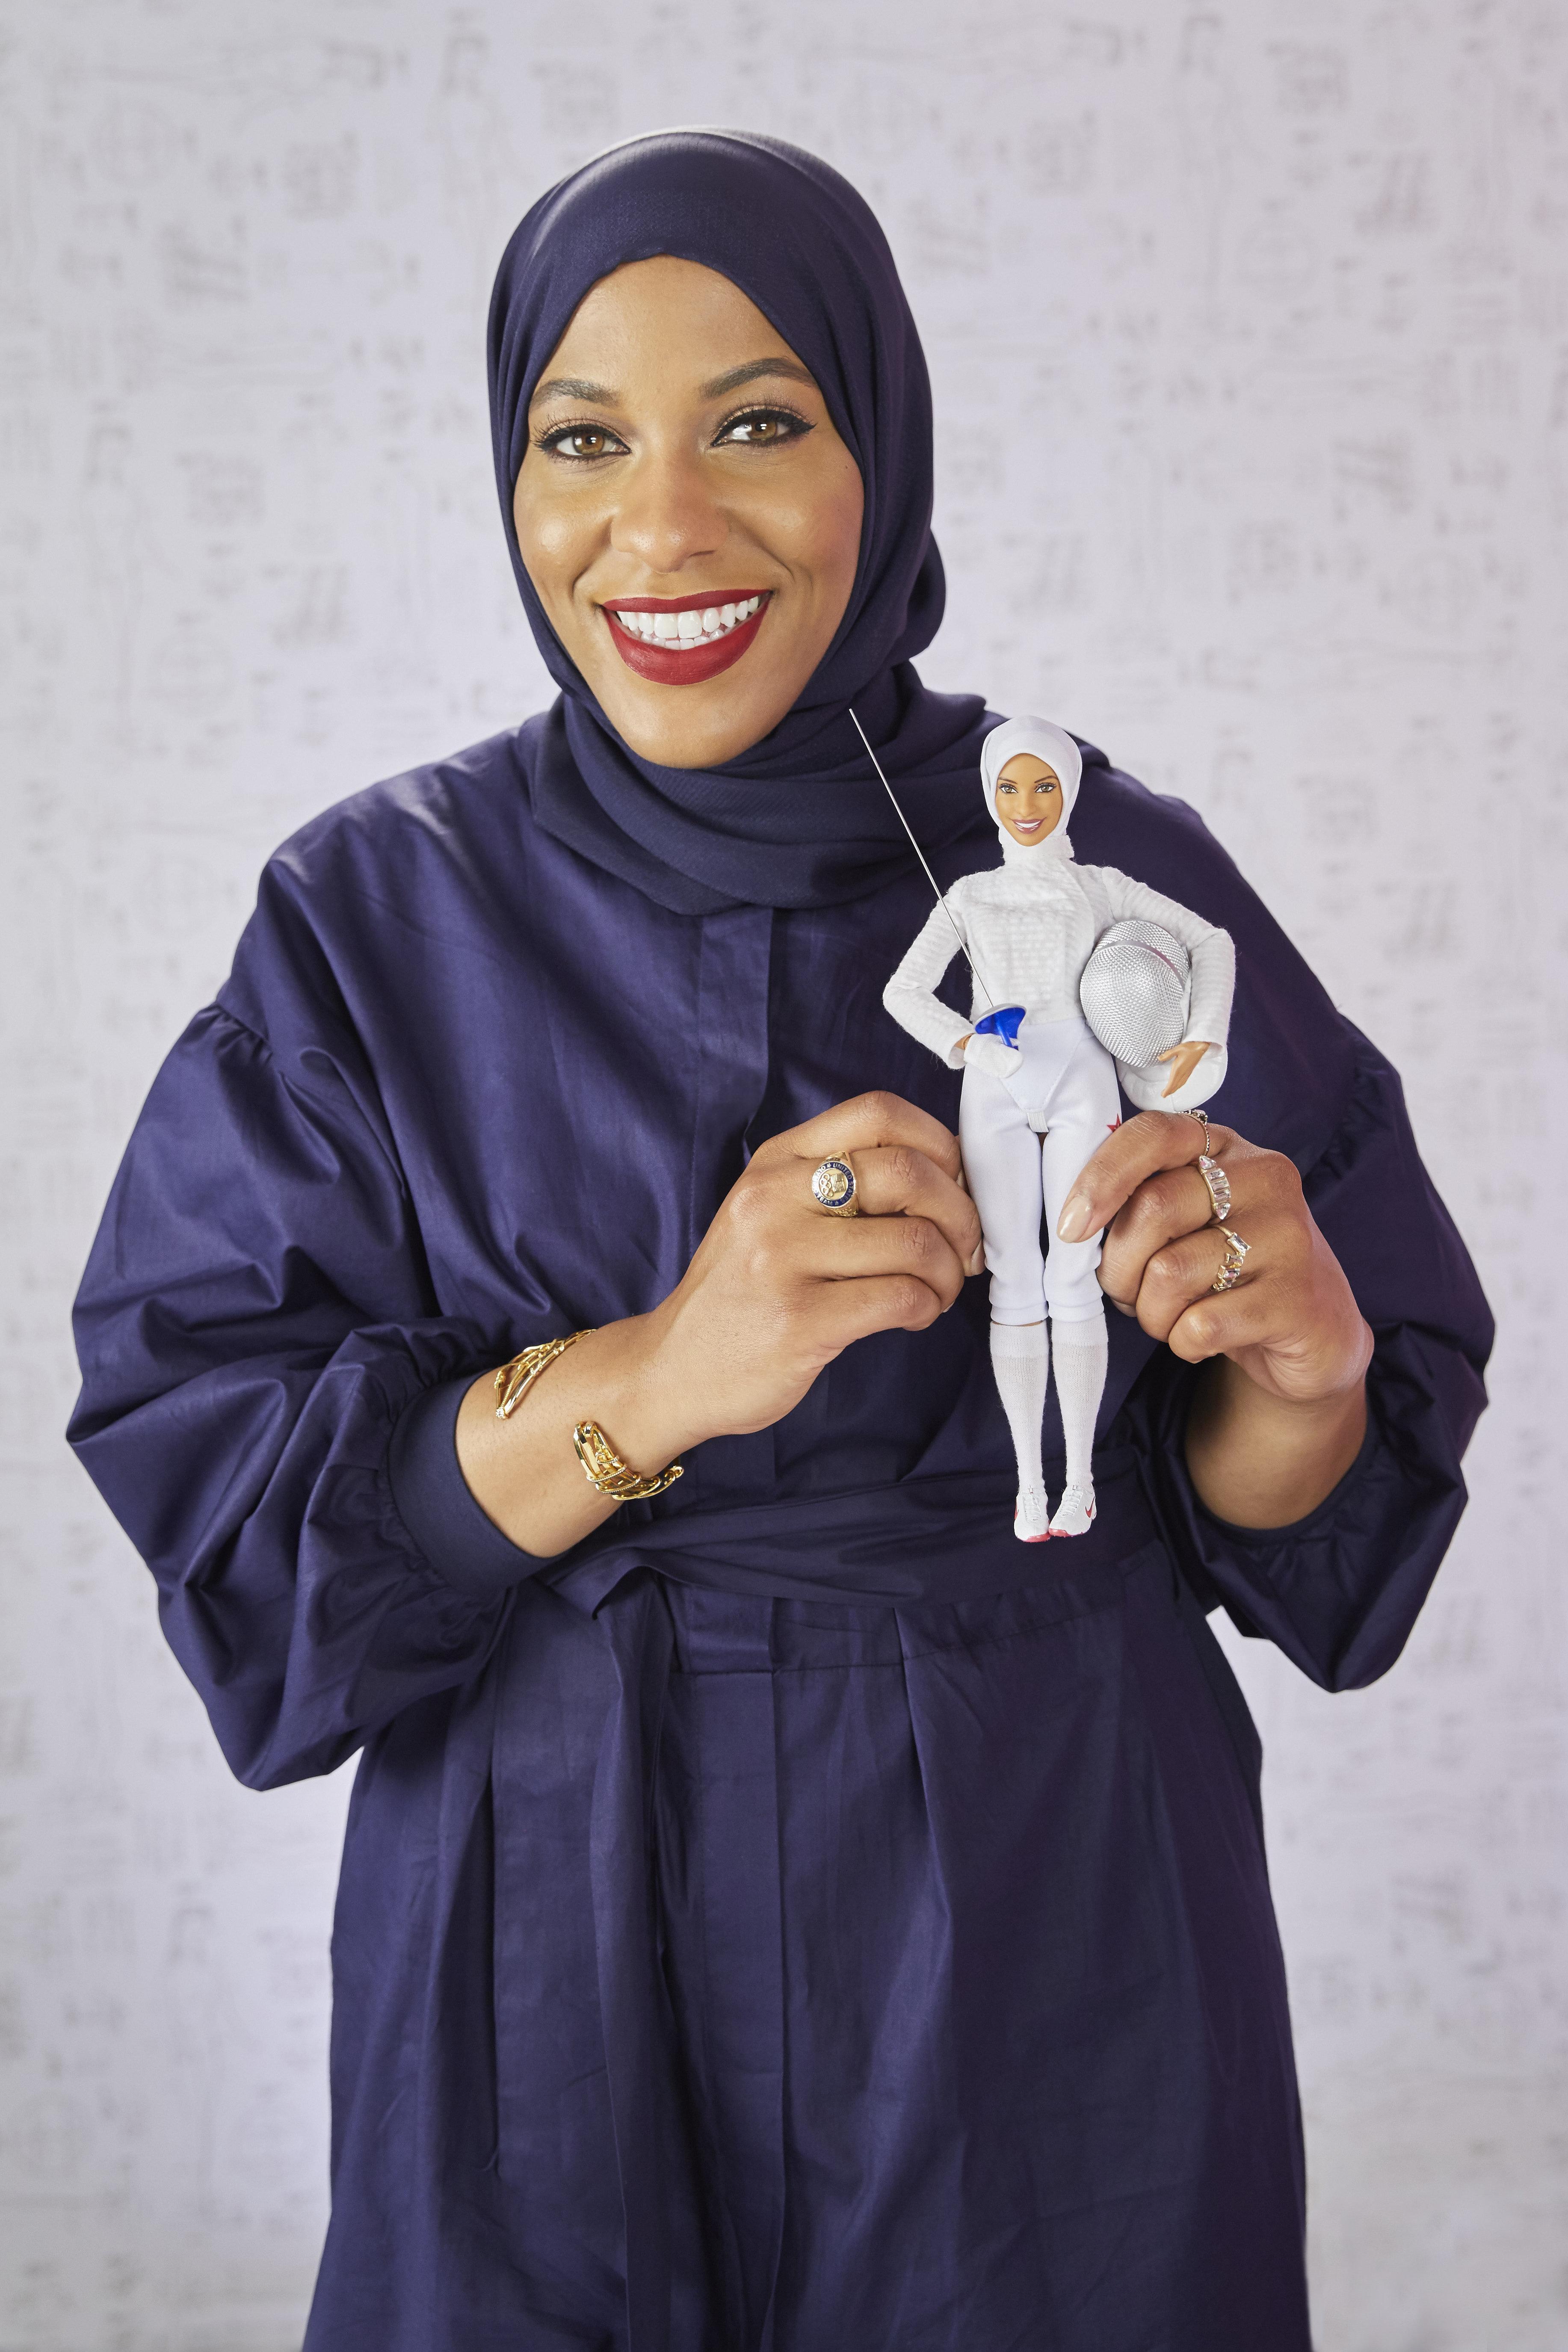 Olympic Fencer Ibtihaj Muhammad Just Got Her Very Own